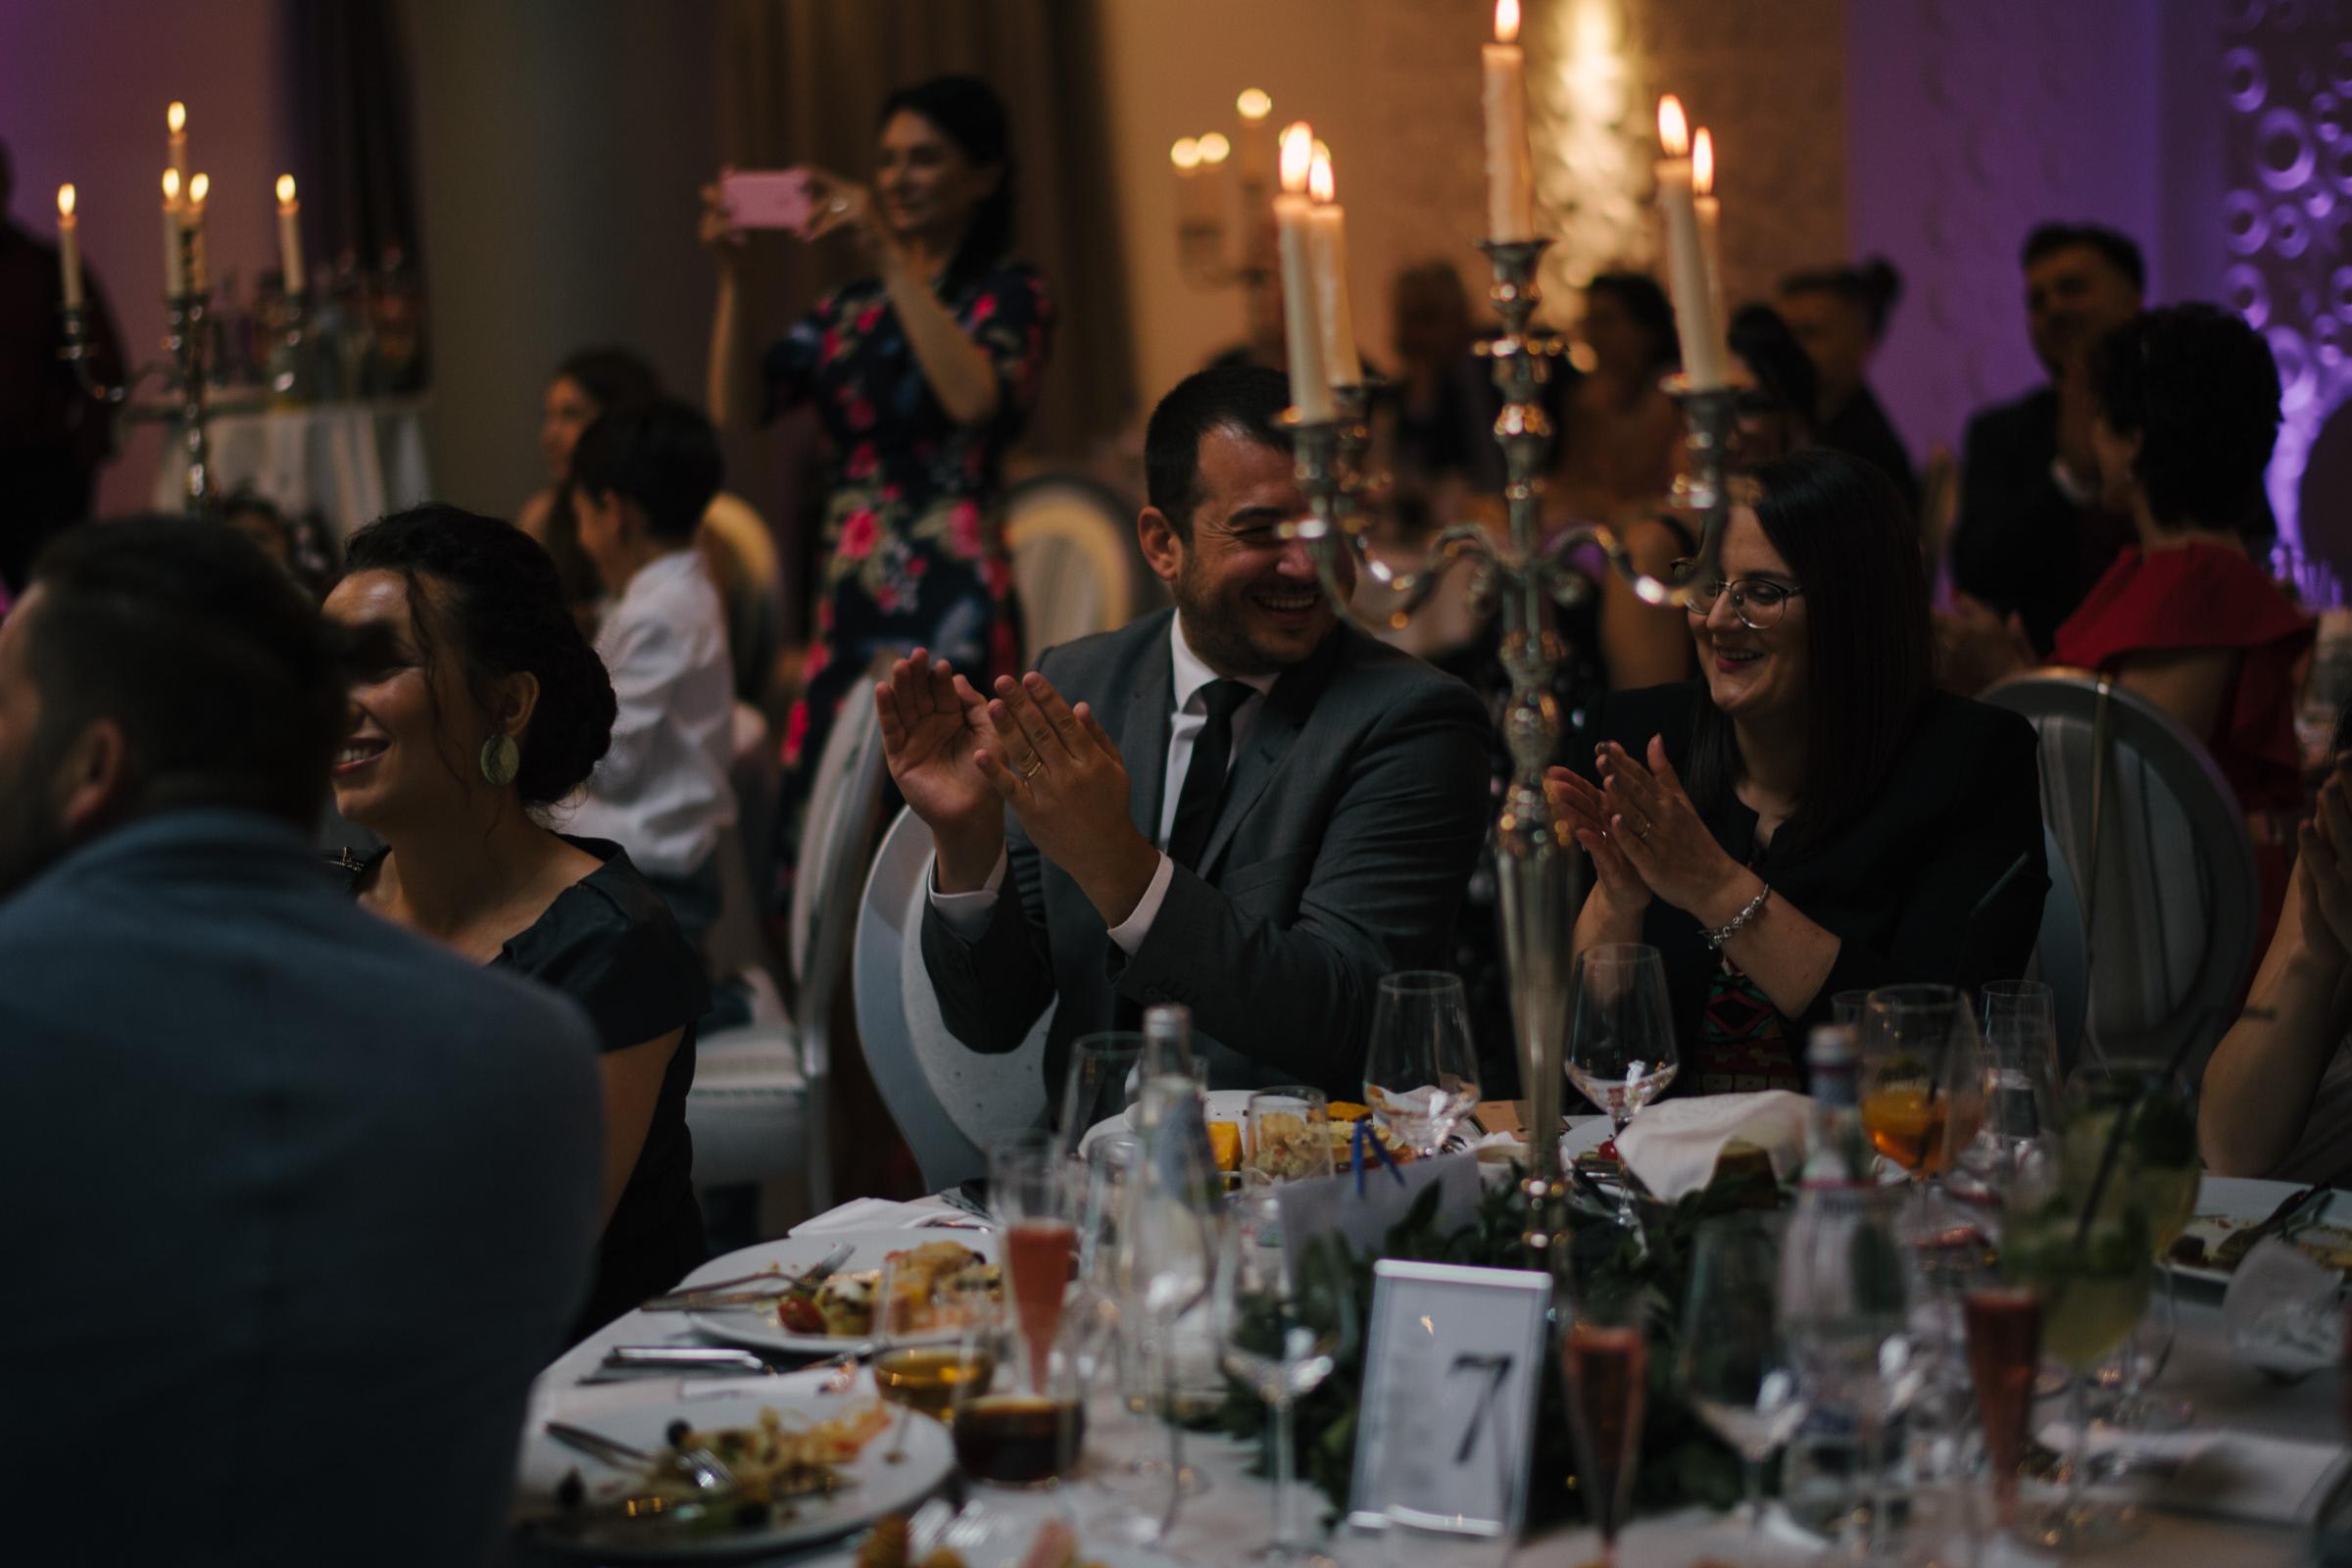 Wedding guests Congratulations